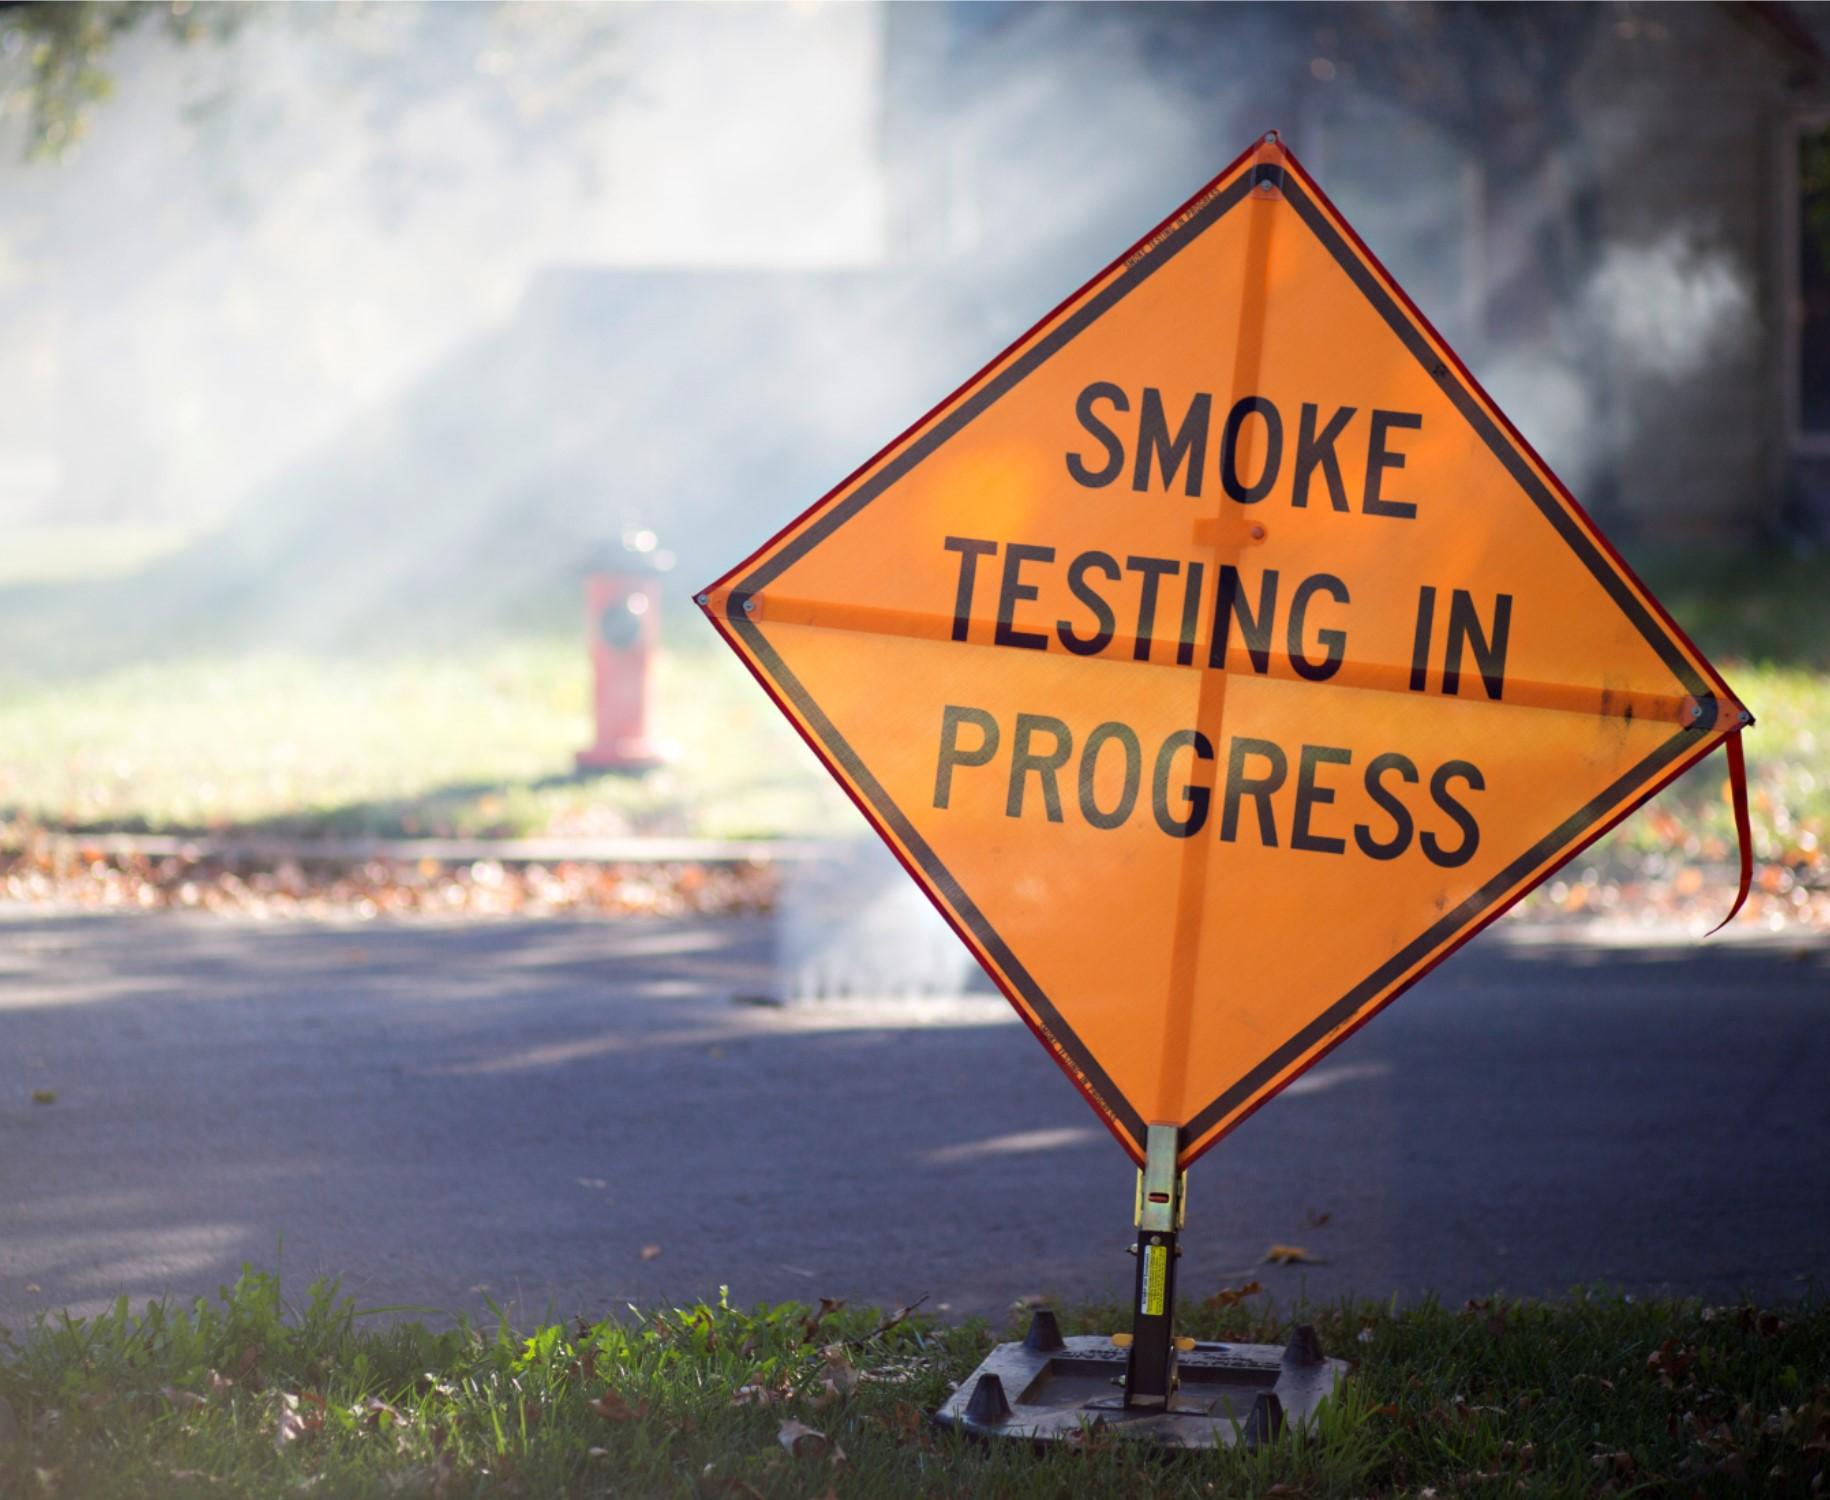 SmokeTestingInProgress.jpg